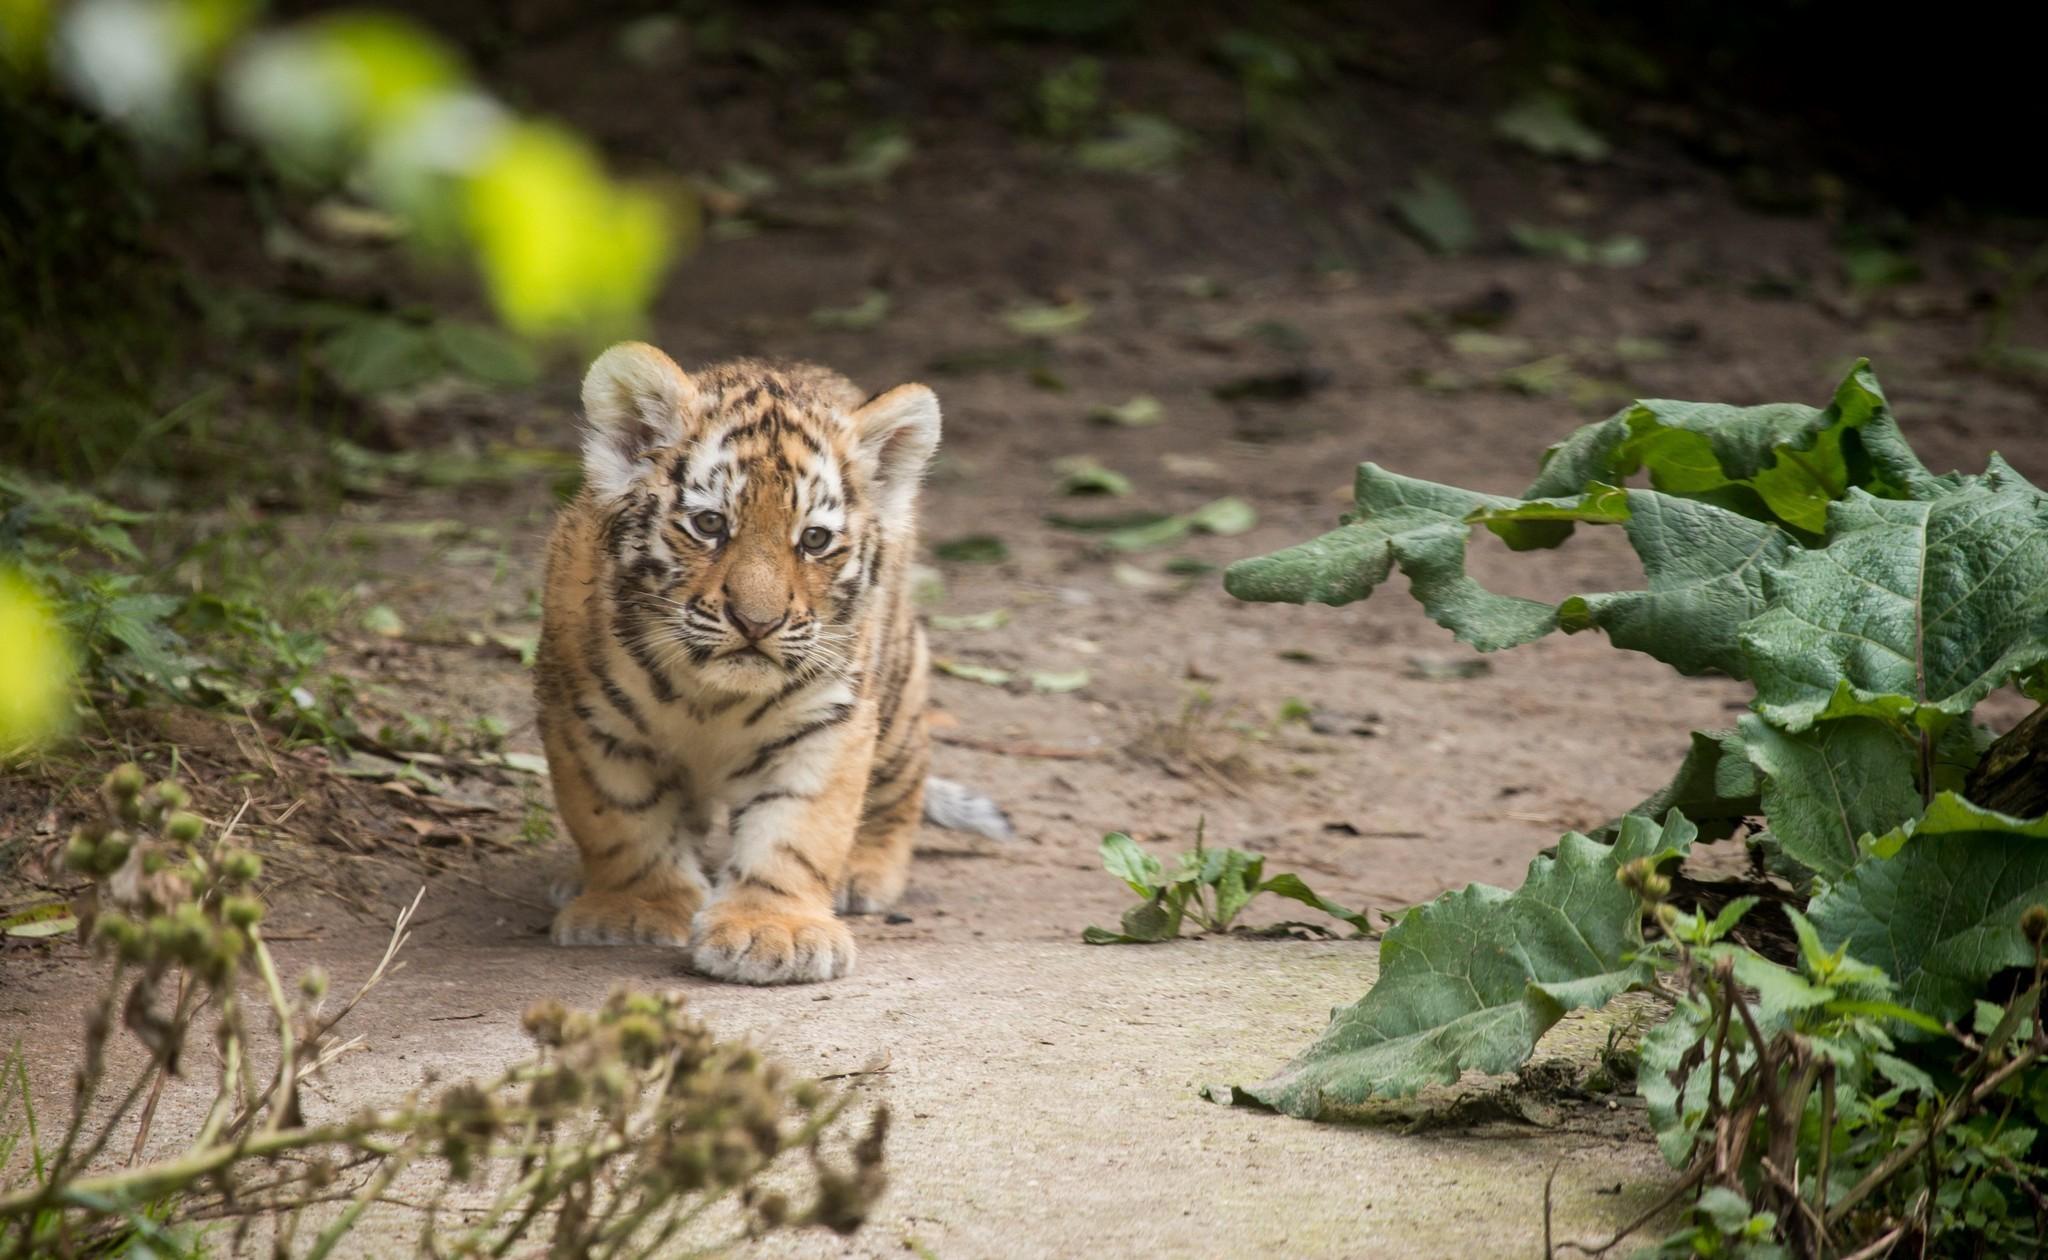 Tiger HD Wallpaper | Background Image | 2048x1260 | ID ...